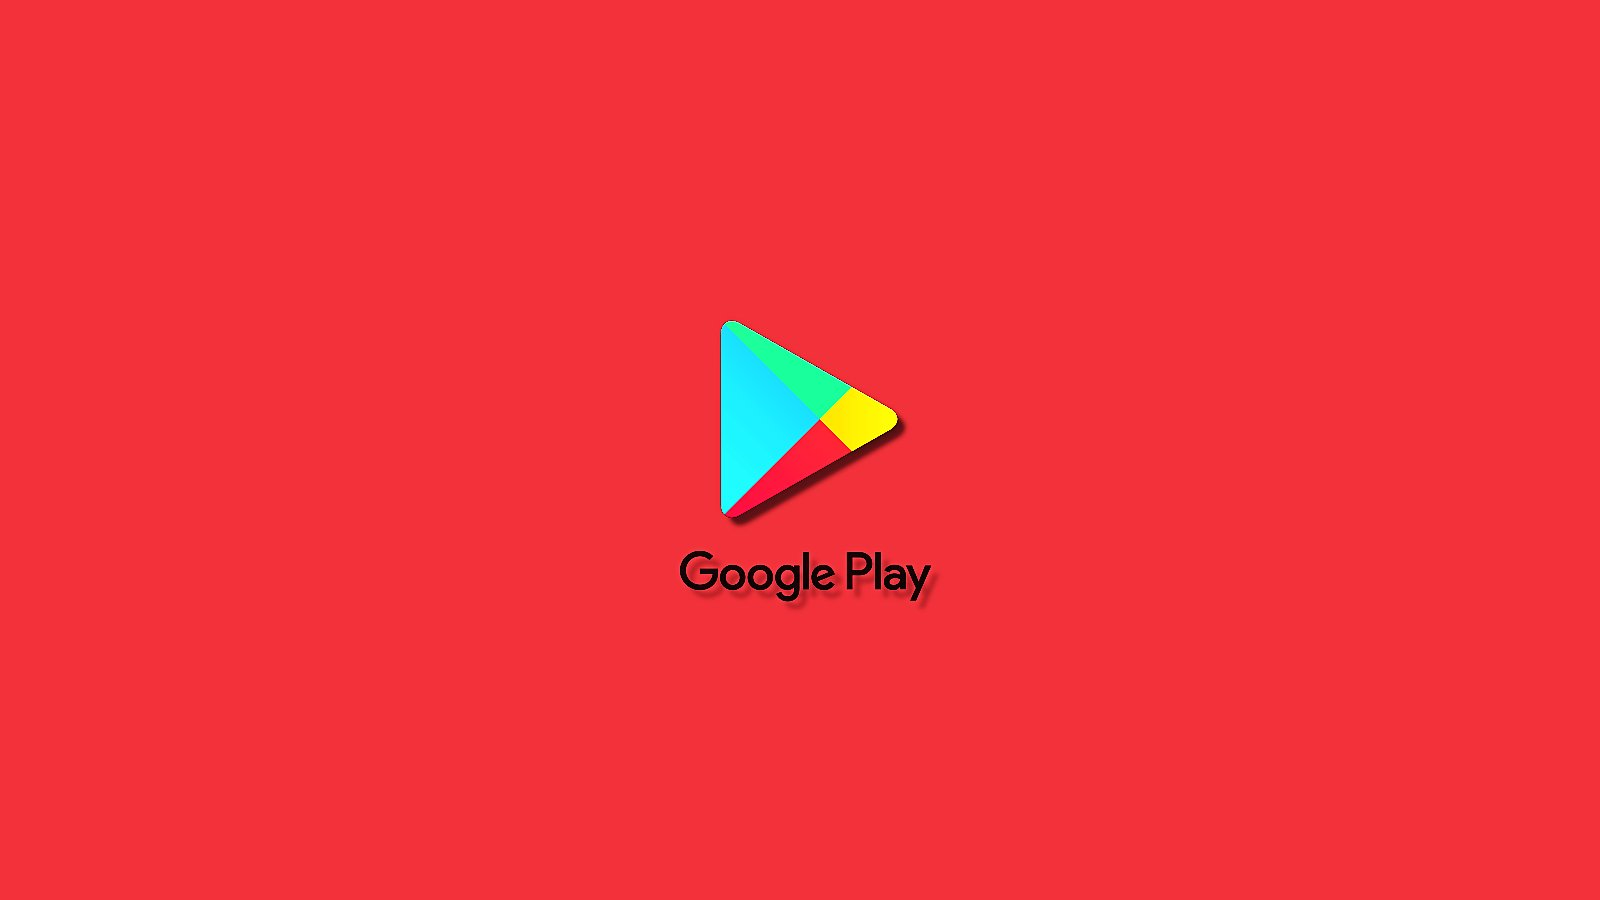 Resiko-Menggunakan-Google-Play-Store-Apk